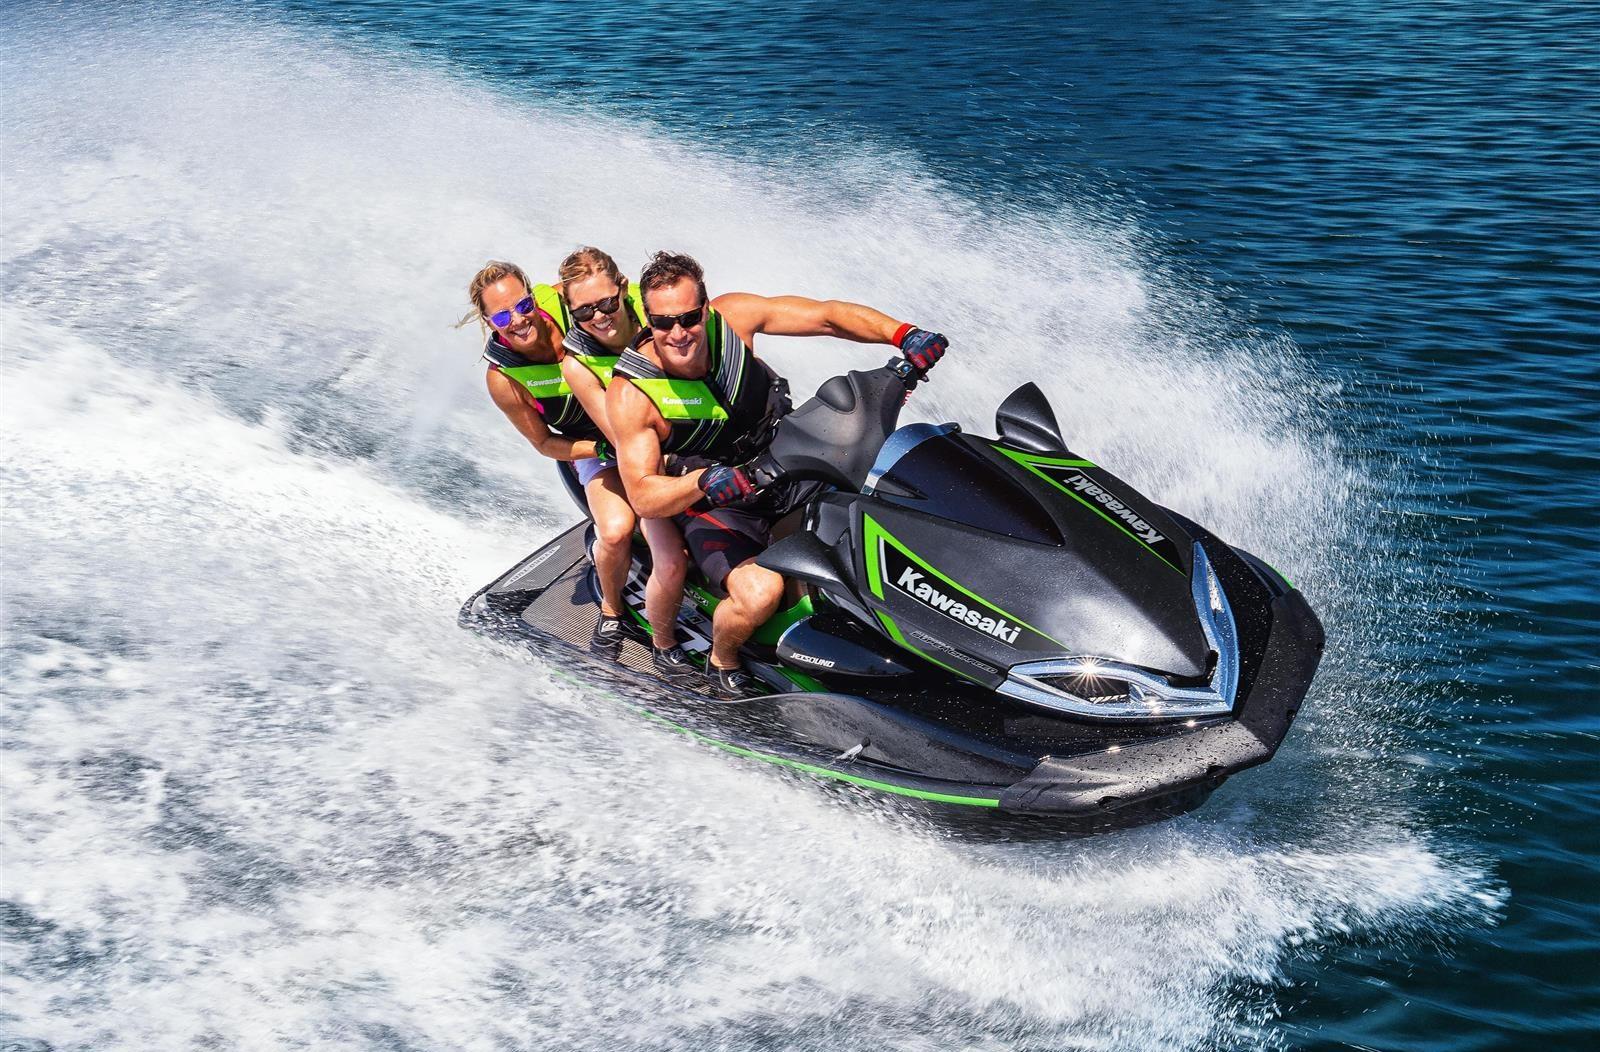 Kawasaki ultra 310 lx